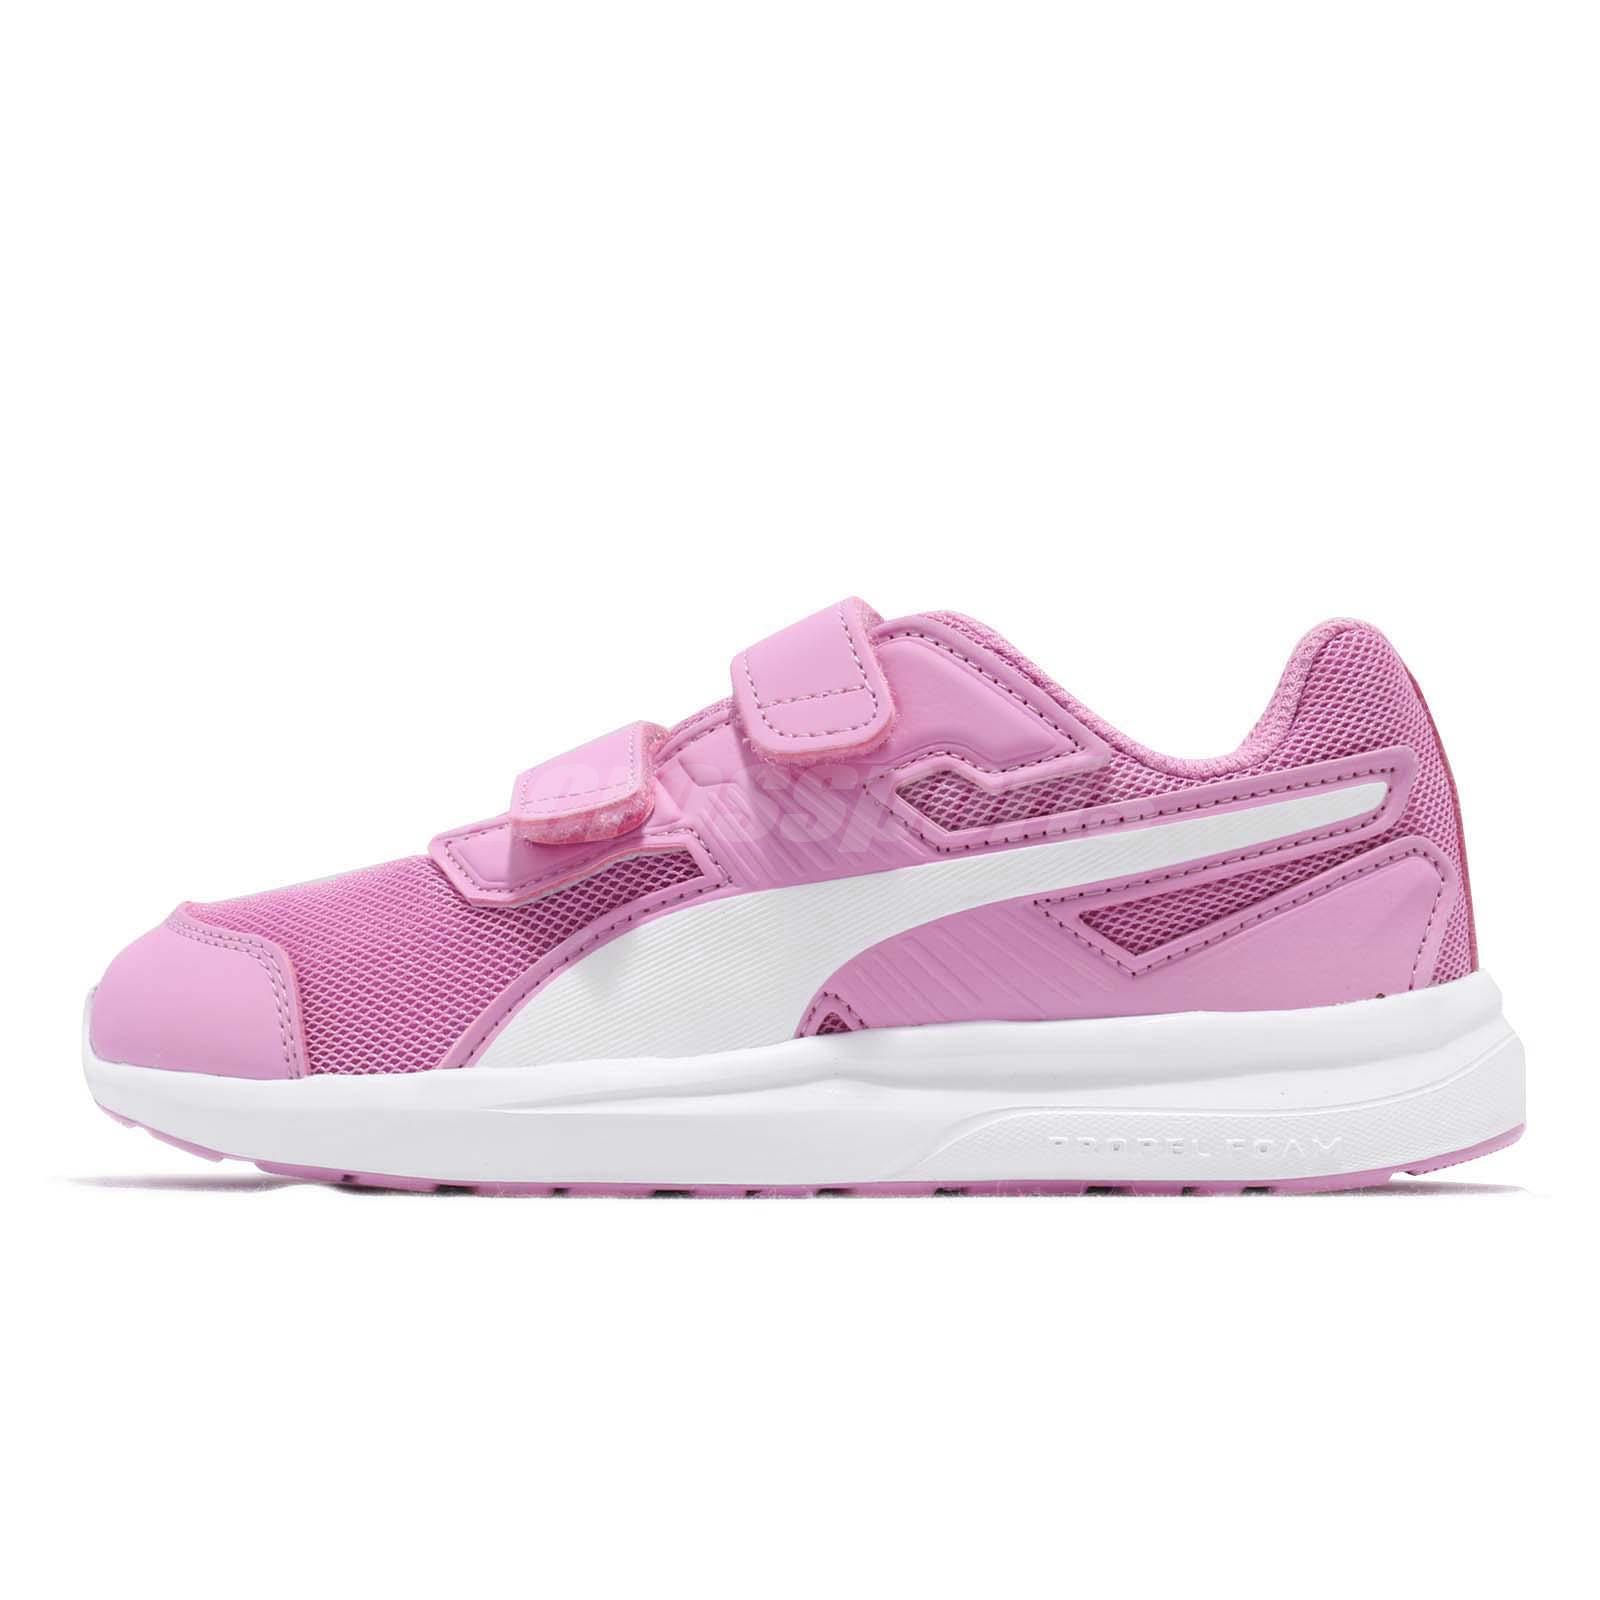 Puma Escaper Mesh V PS Orchid White Strap Kid Preschool Shoes Sneakers  190326-09 202bf7c04b4